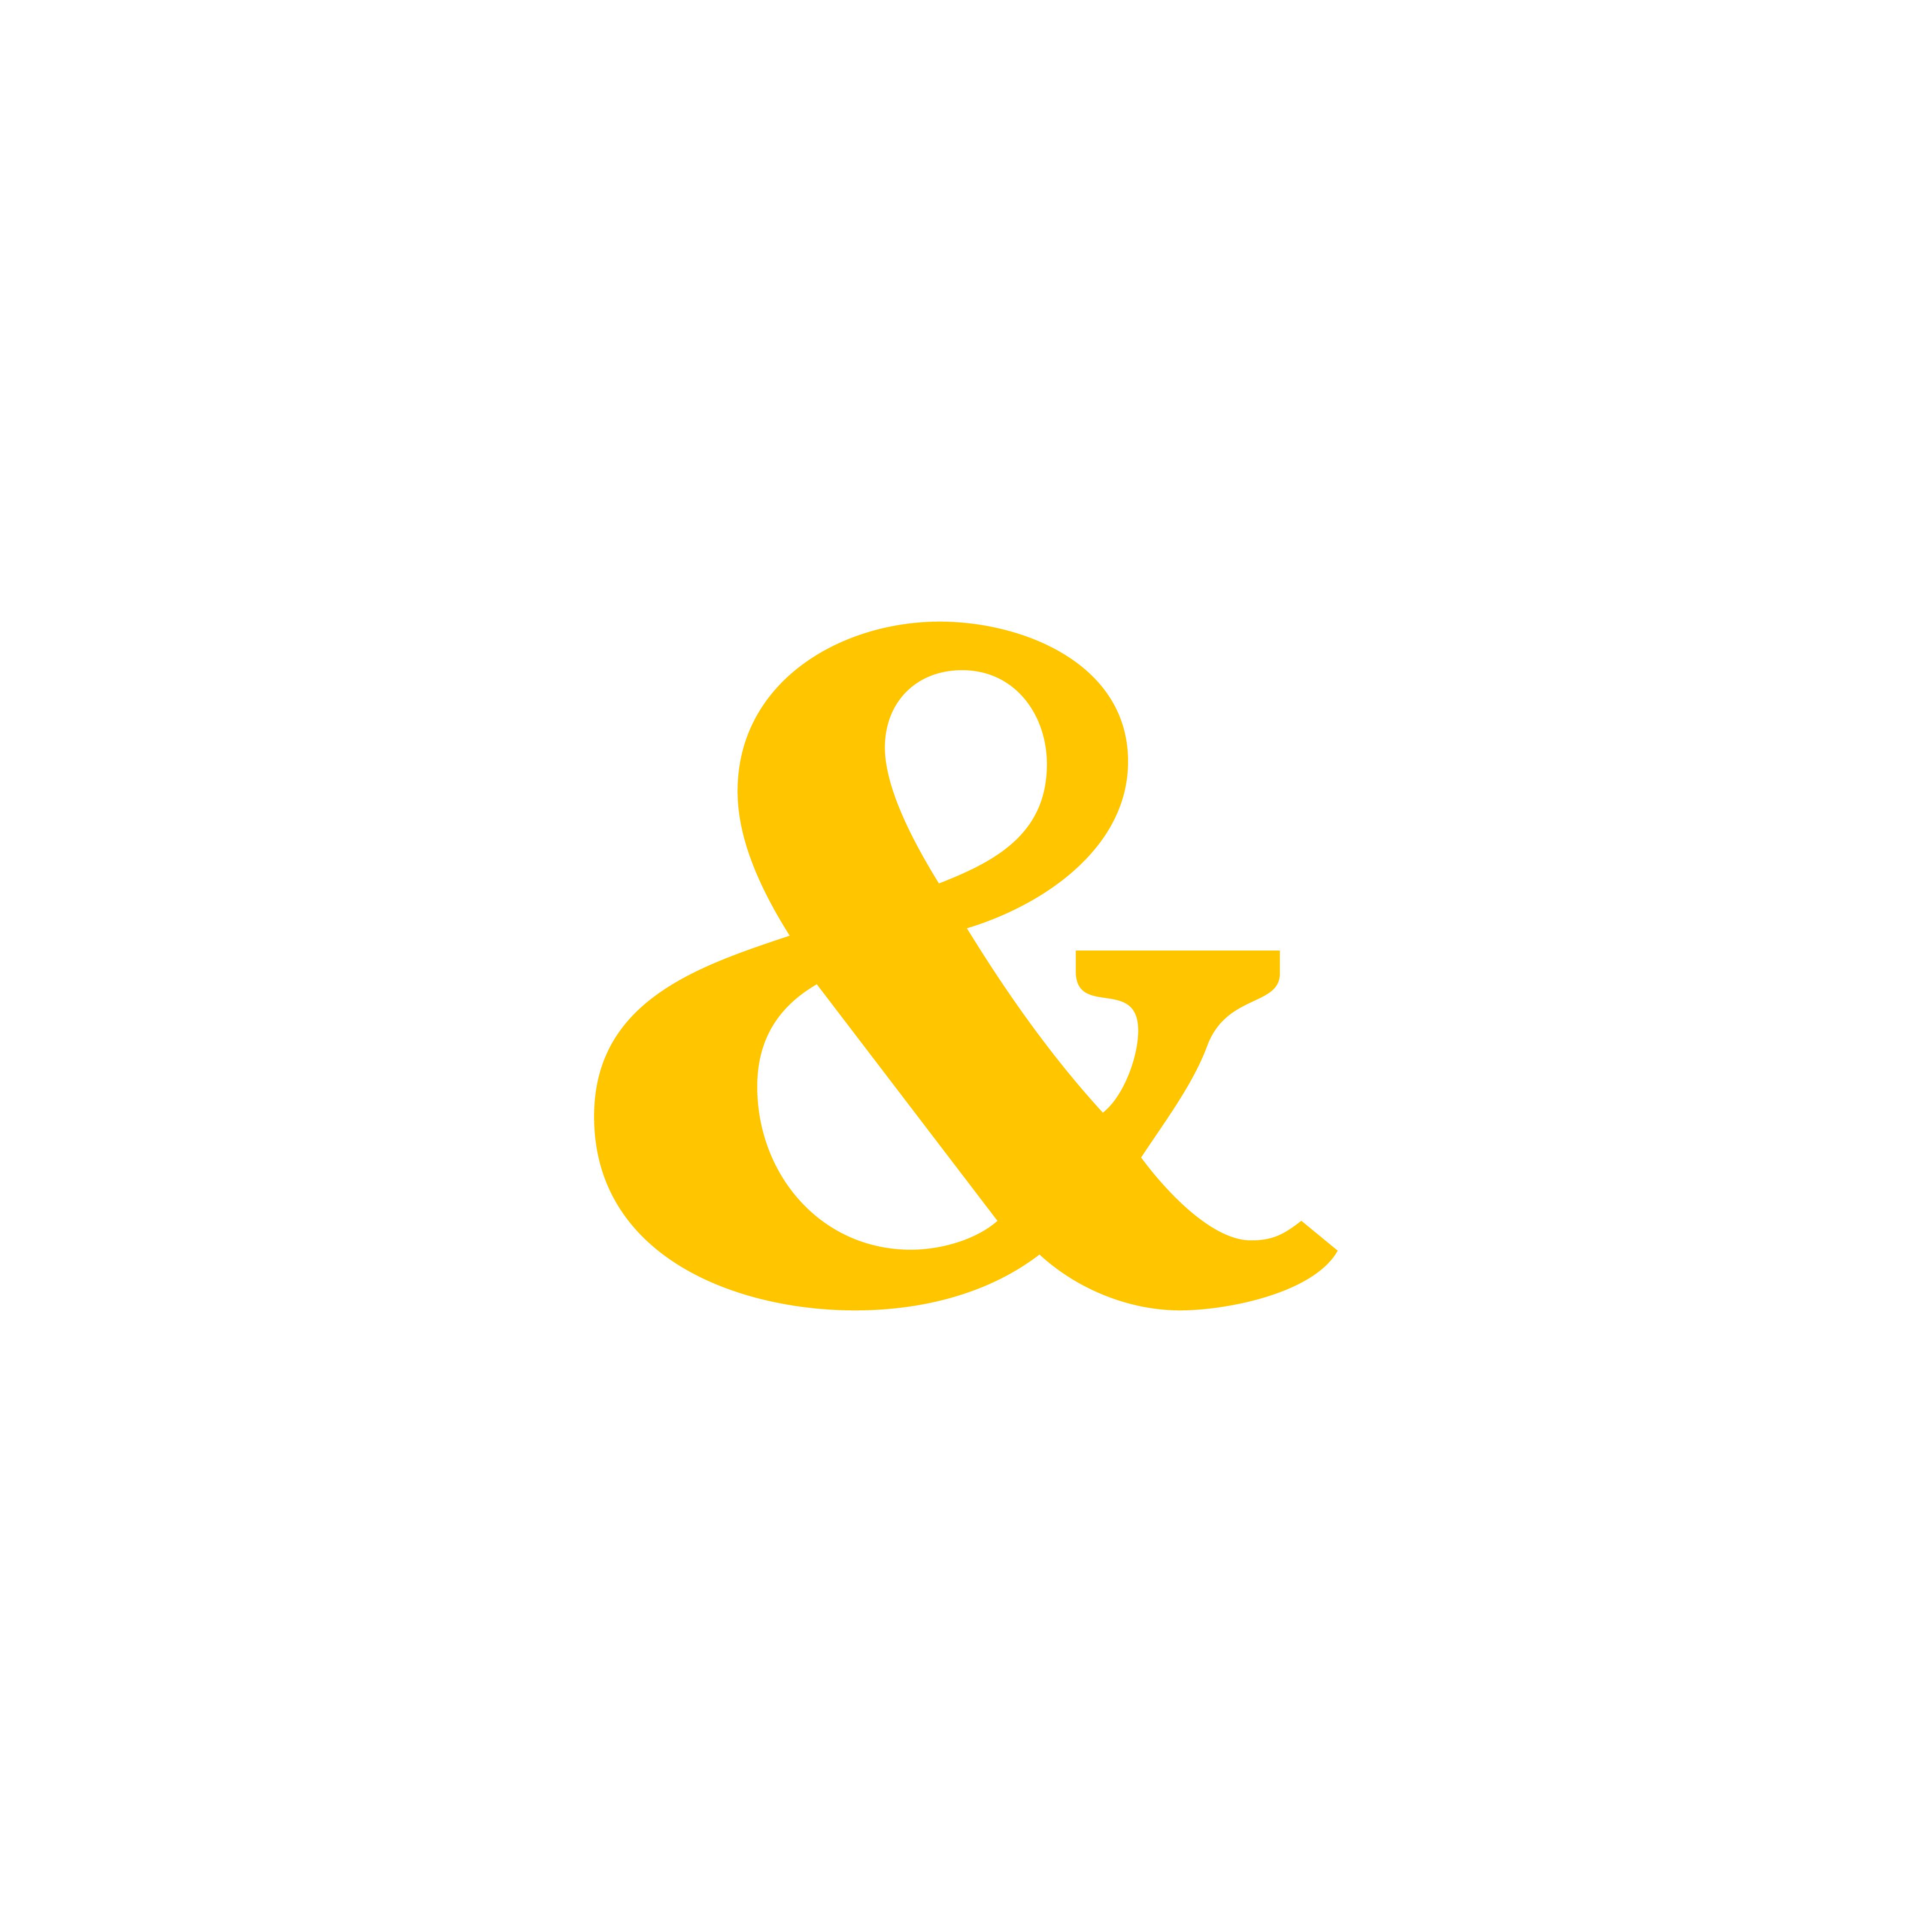 Hay & Co. Design on LogoLounge